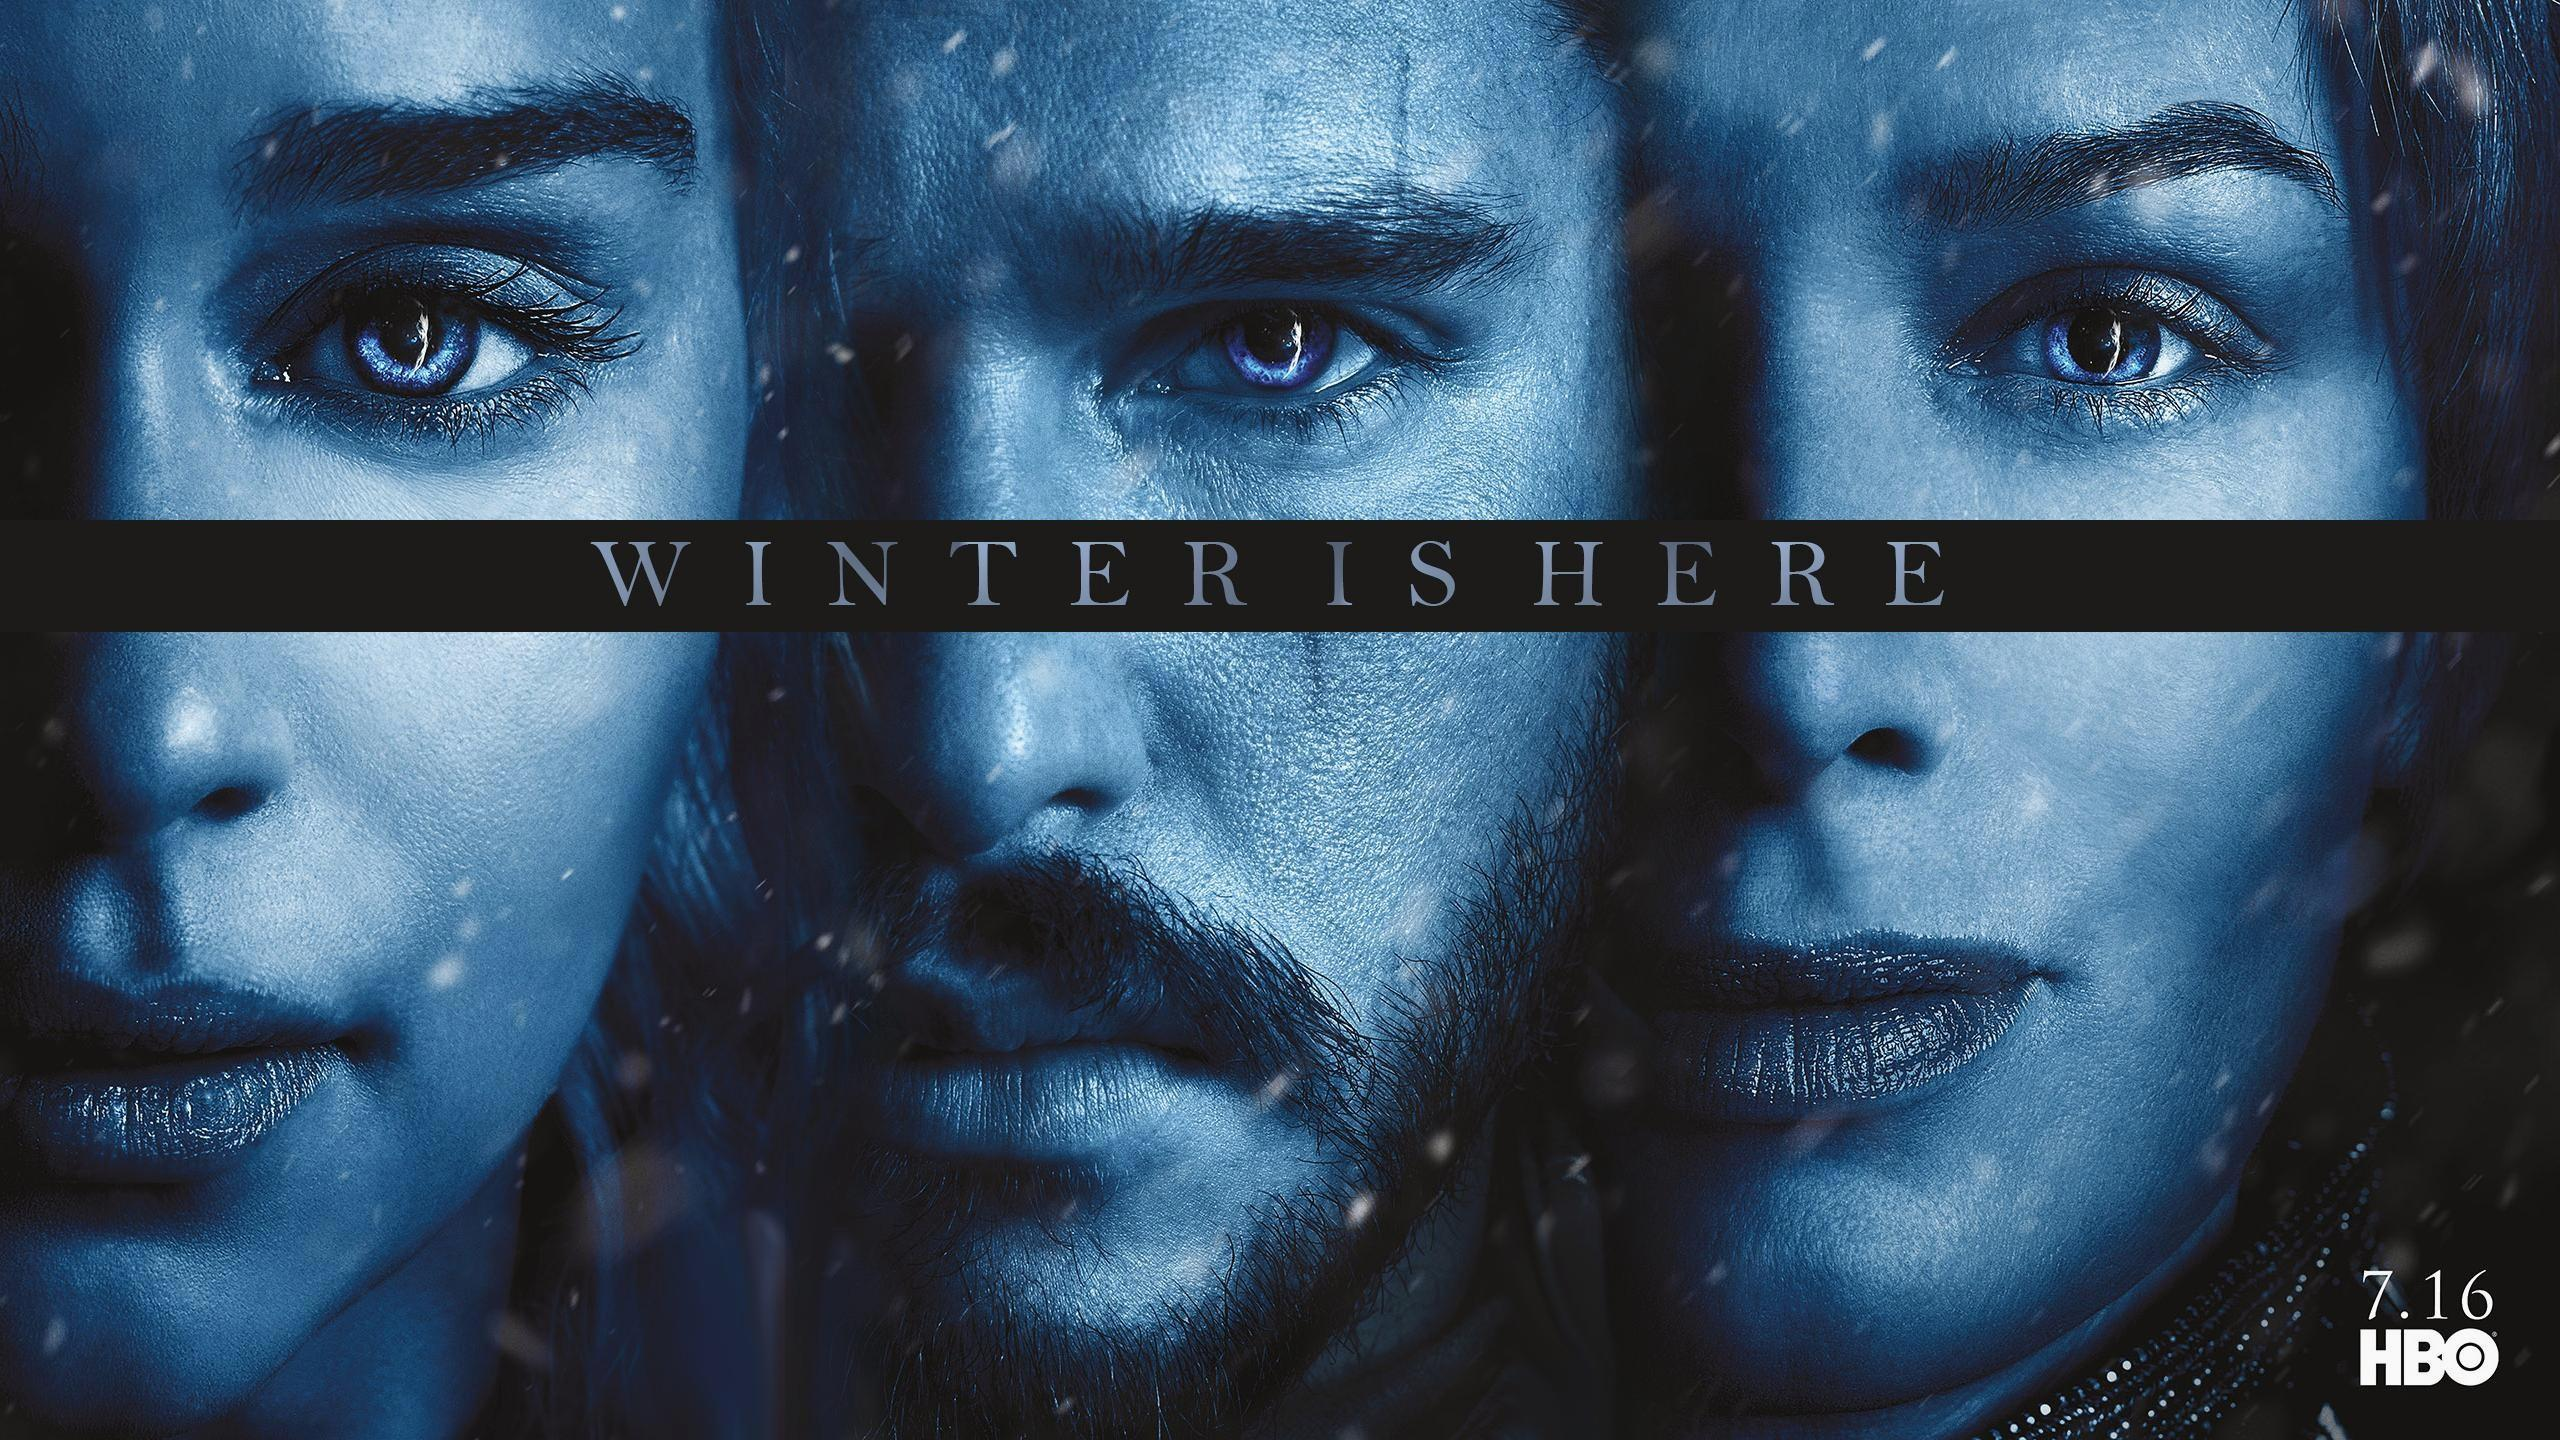 Wallpaper Reddit - Game Of Thrones Season 8 Winter Is Here - HD Wallpaper